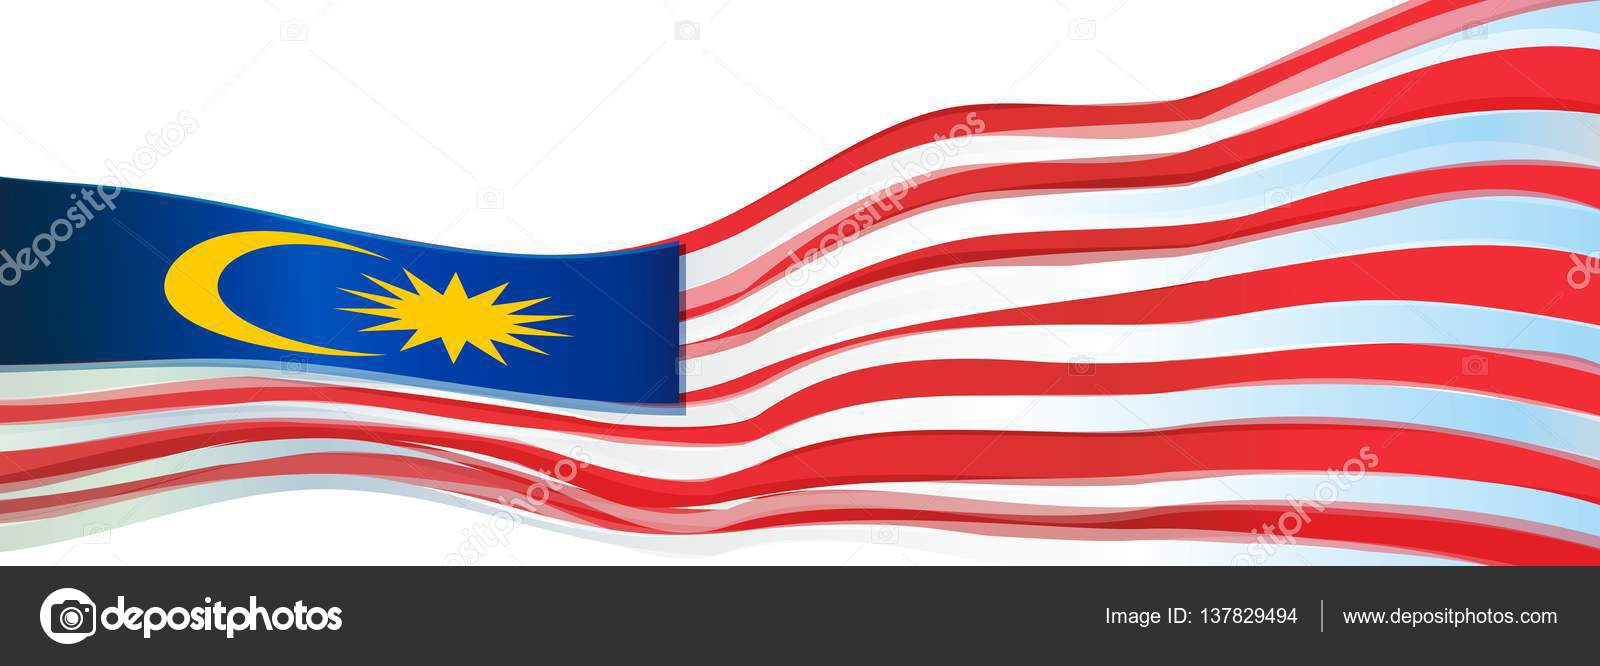 flagge rot blau gelber stern